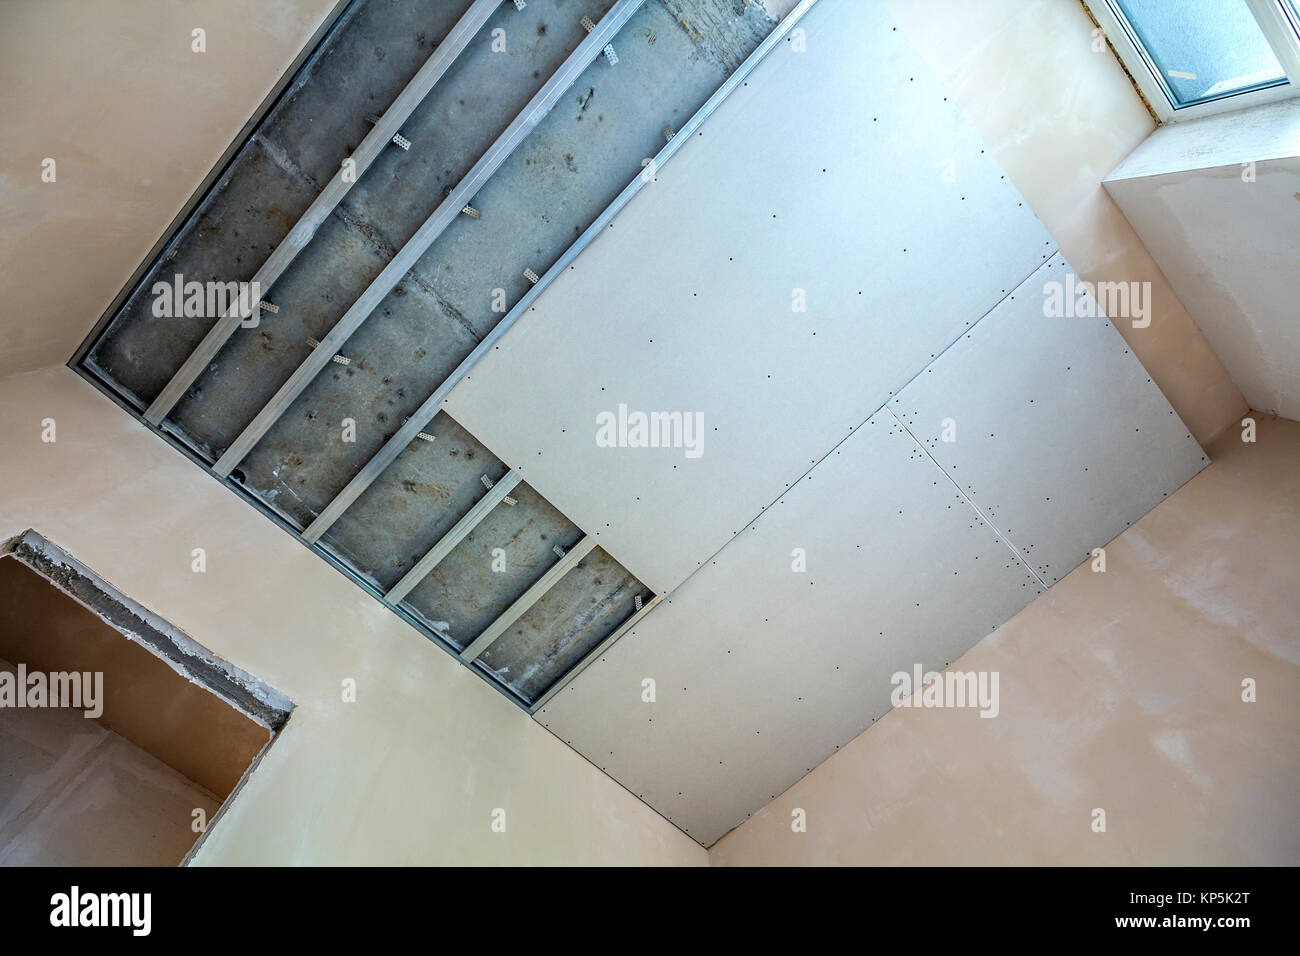 Room Screw Stockfotos & Room Screw Bilder - Seite 4 - Alamy